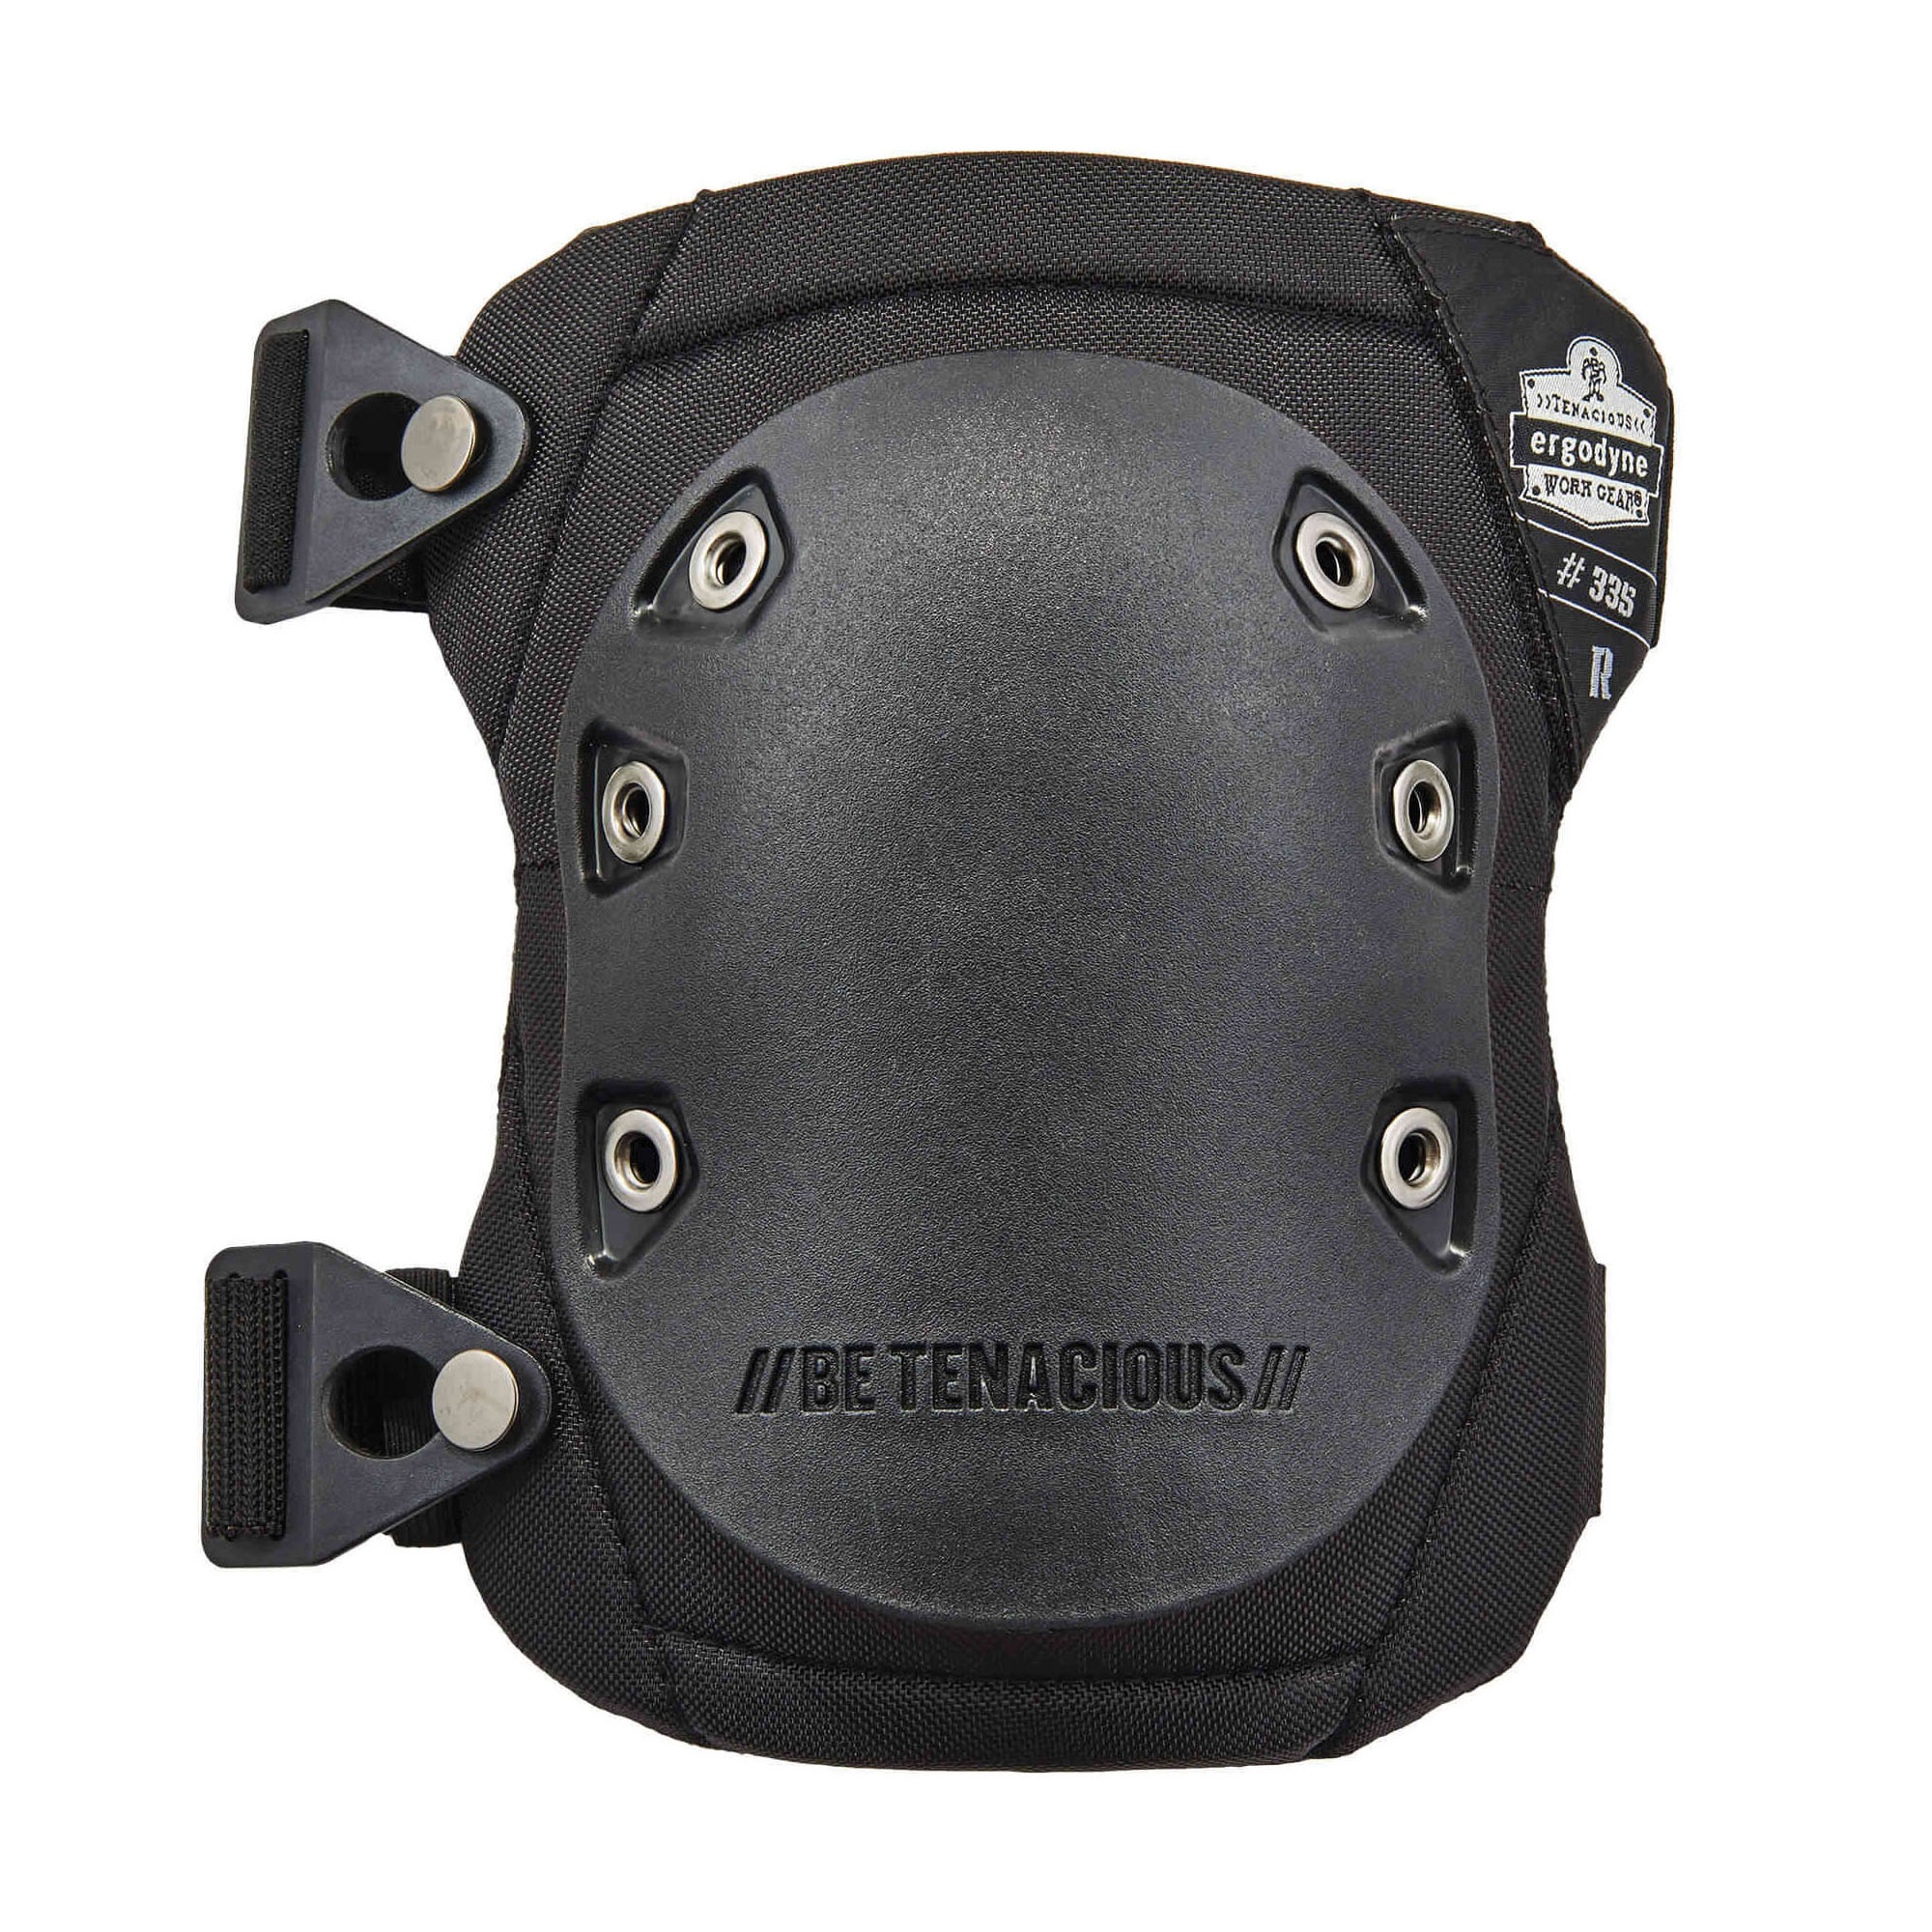 ProFlex® 18335 Non-Marring Cap Knee Pads, Rubber Cap, NBR Foam Pad, Buckle Closure, Black